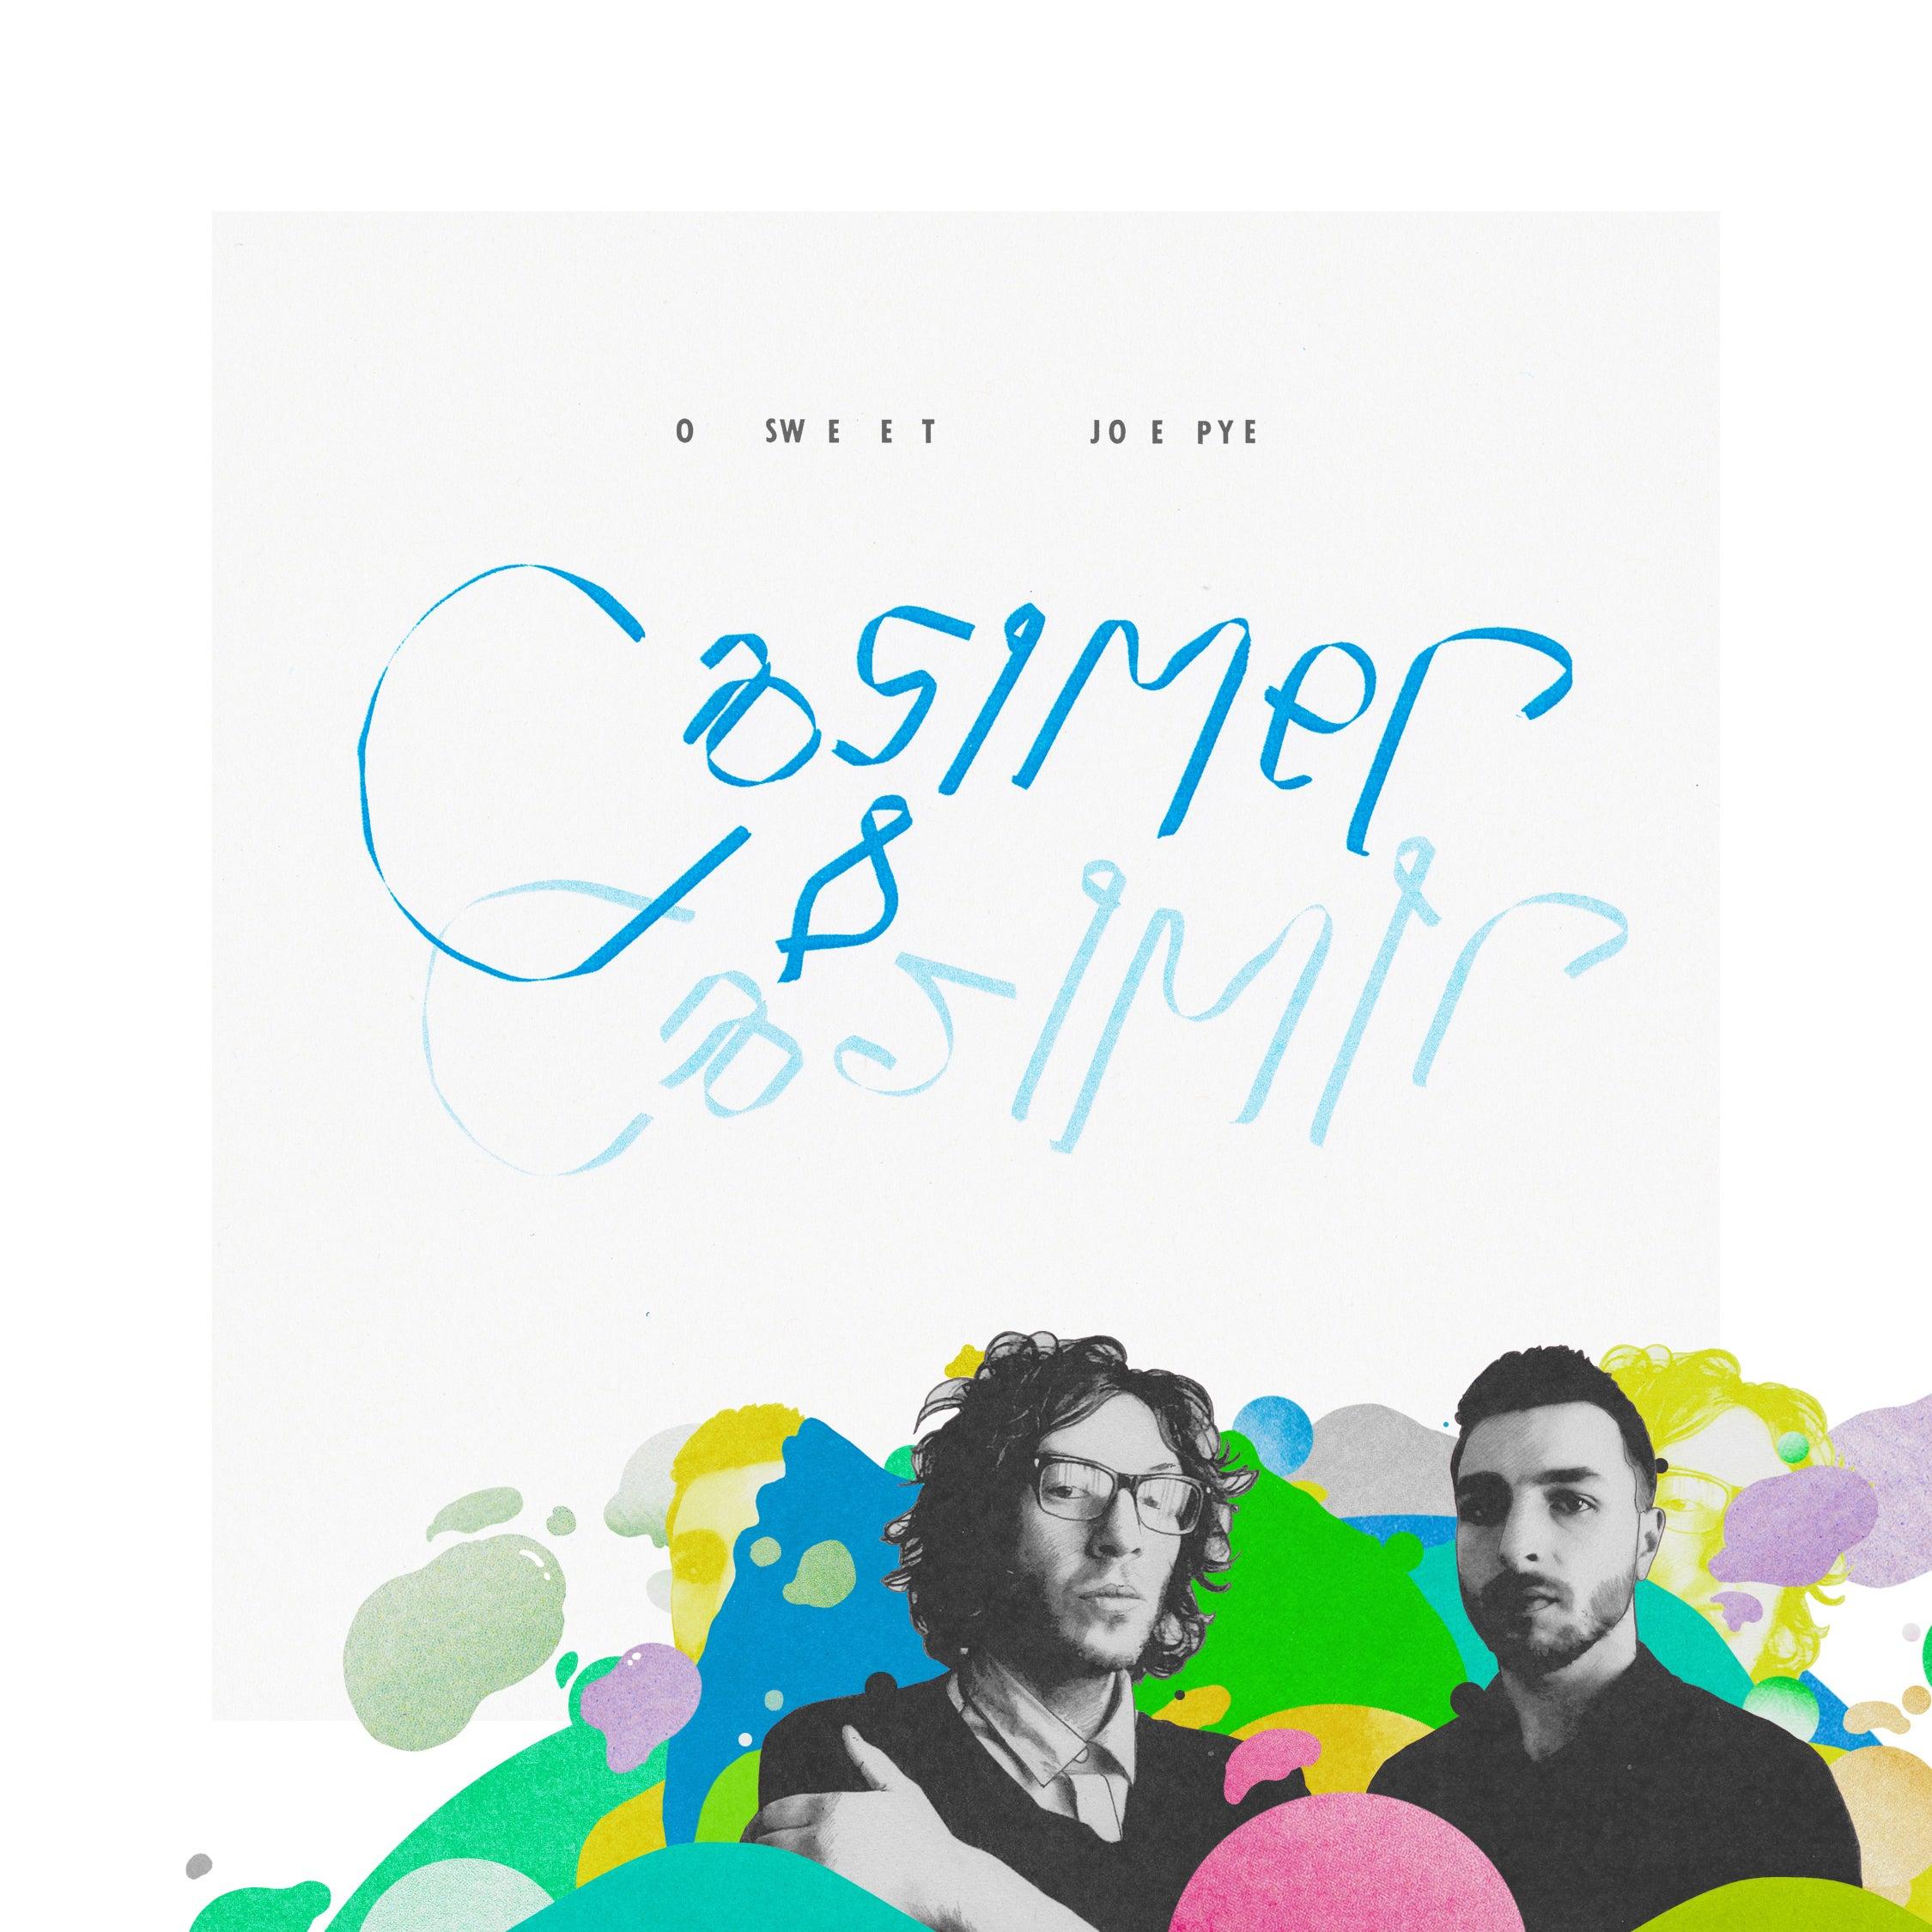 "Casimer&Casimir 'O Sweet Joe Pye' (7"" single)"